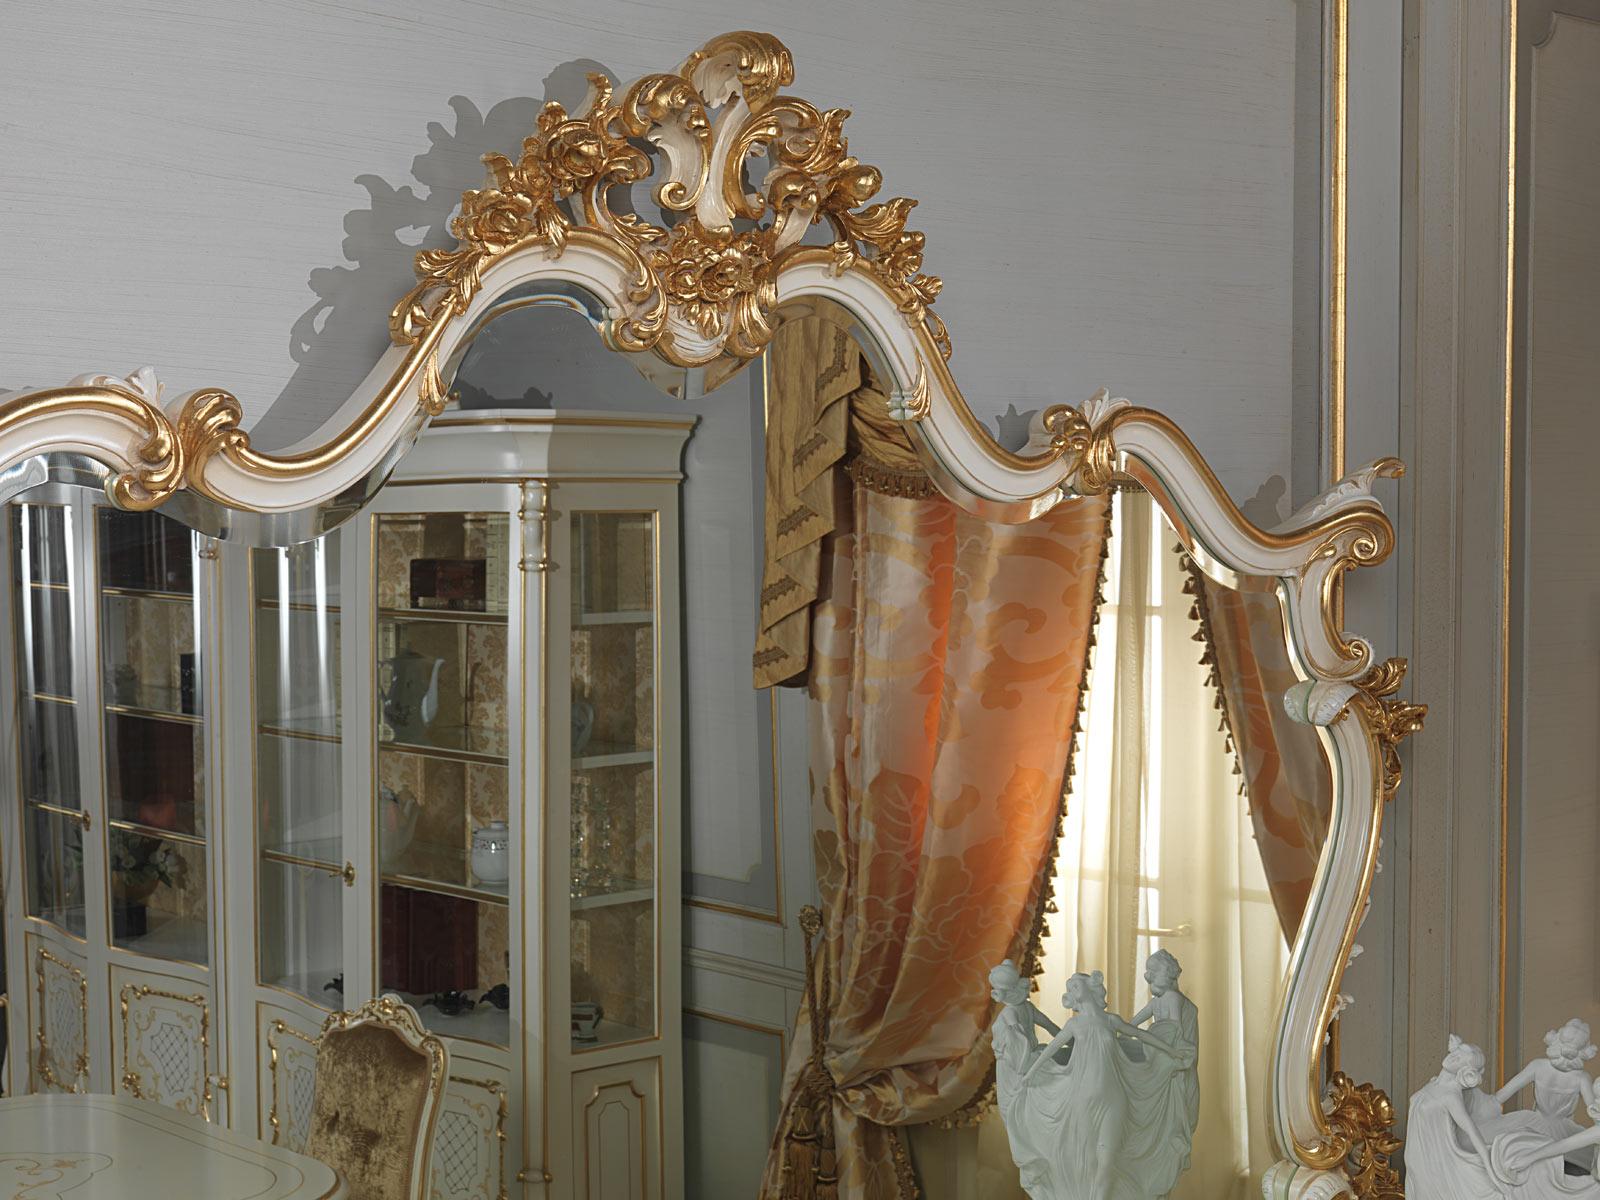 Specchiera In Stile Luigi XV Vimercati Meda #995E32 1600 1200 Sala Da Pranzo Luce Calda O Fredda